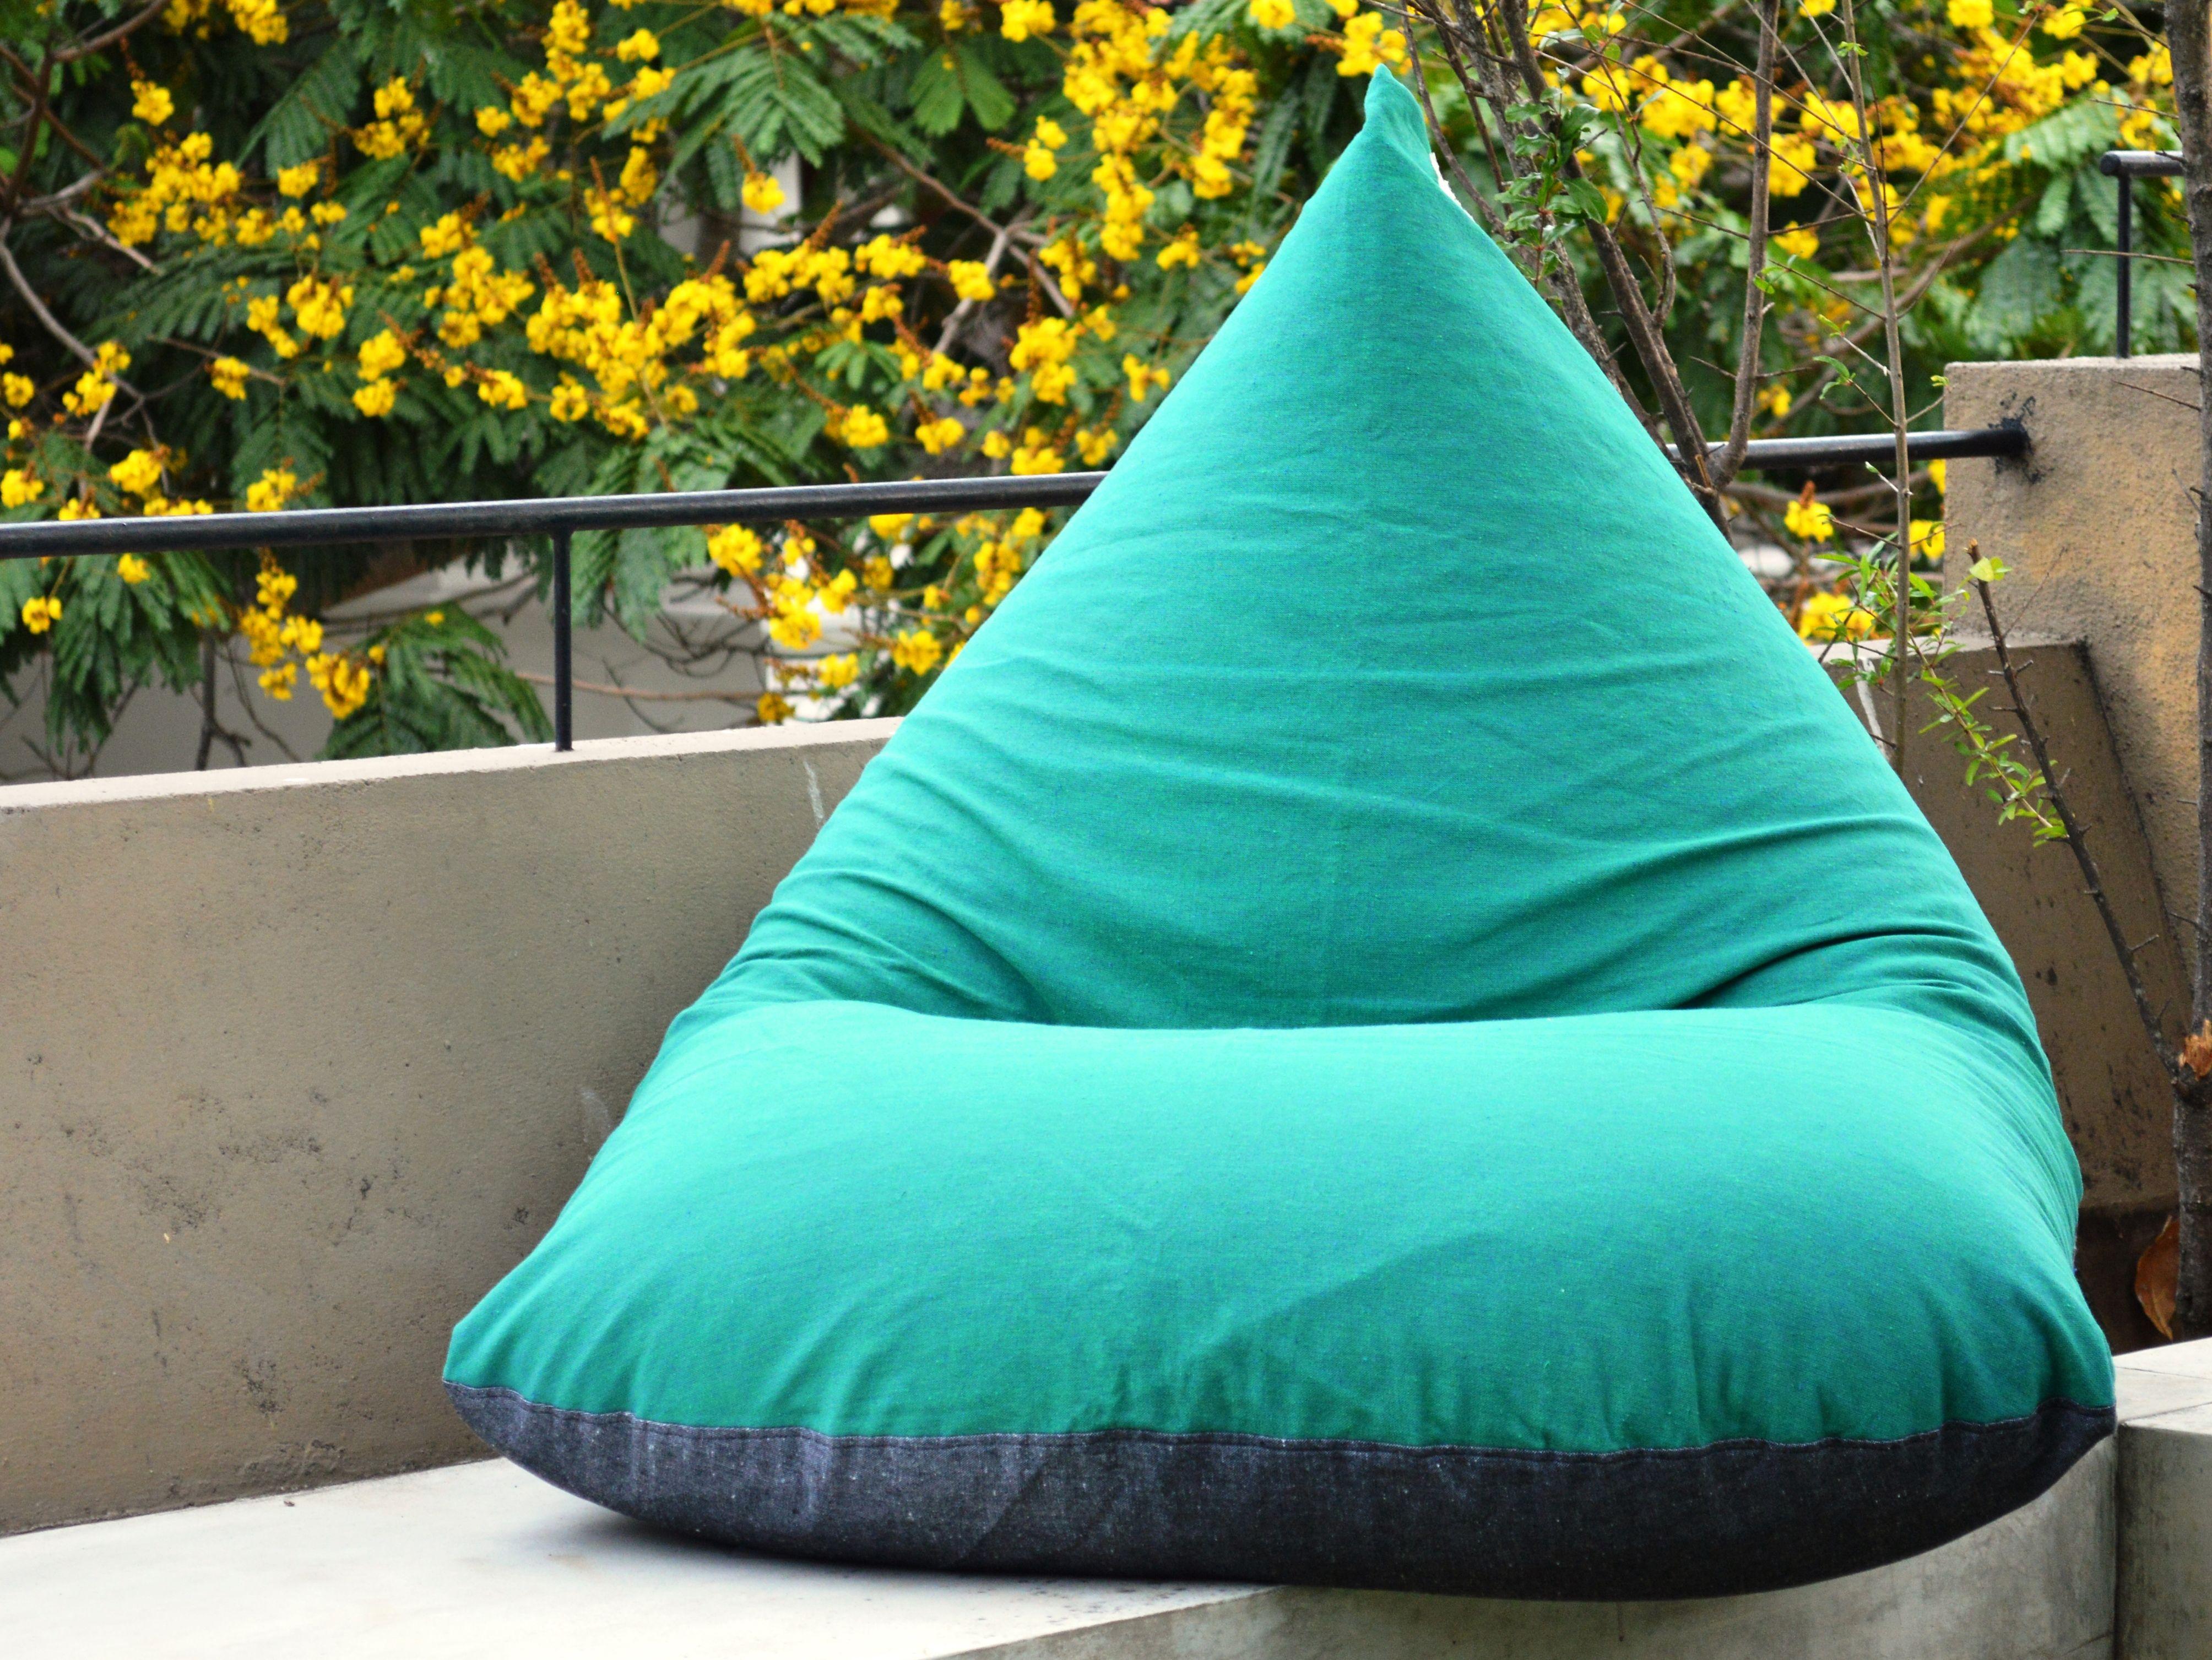 Tarchoal Handloom Bean Bag Chair